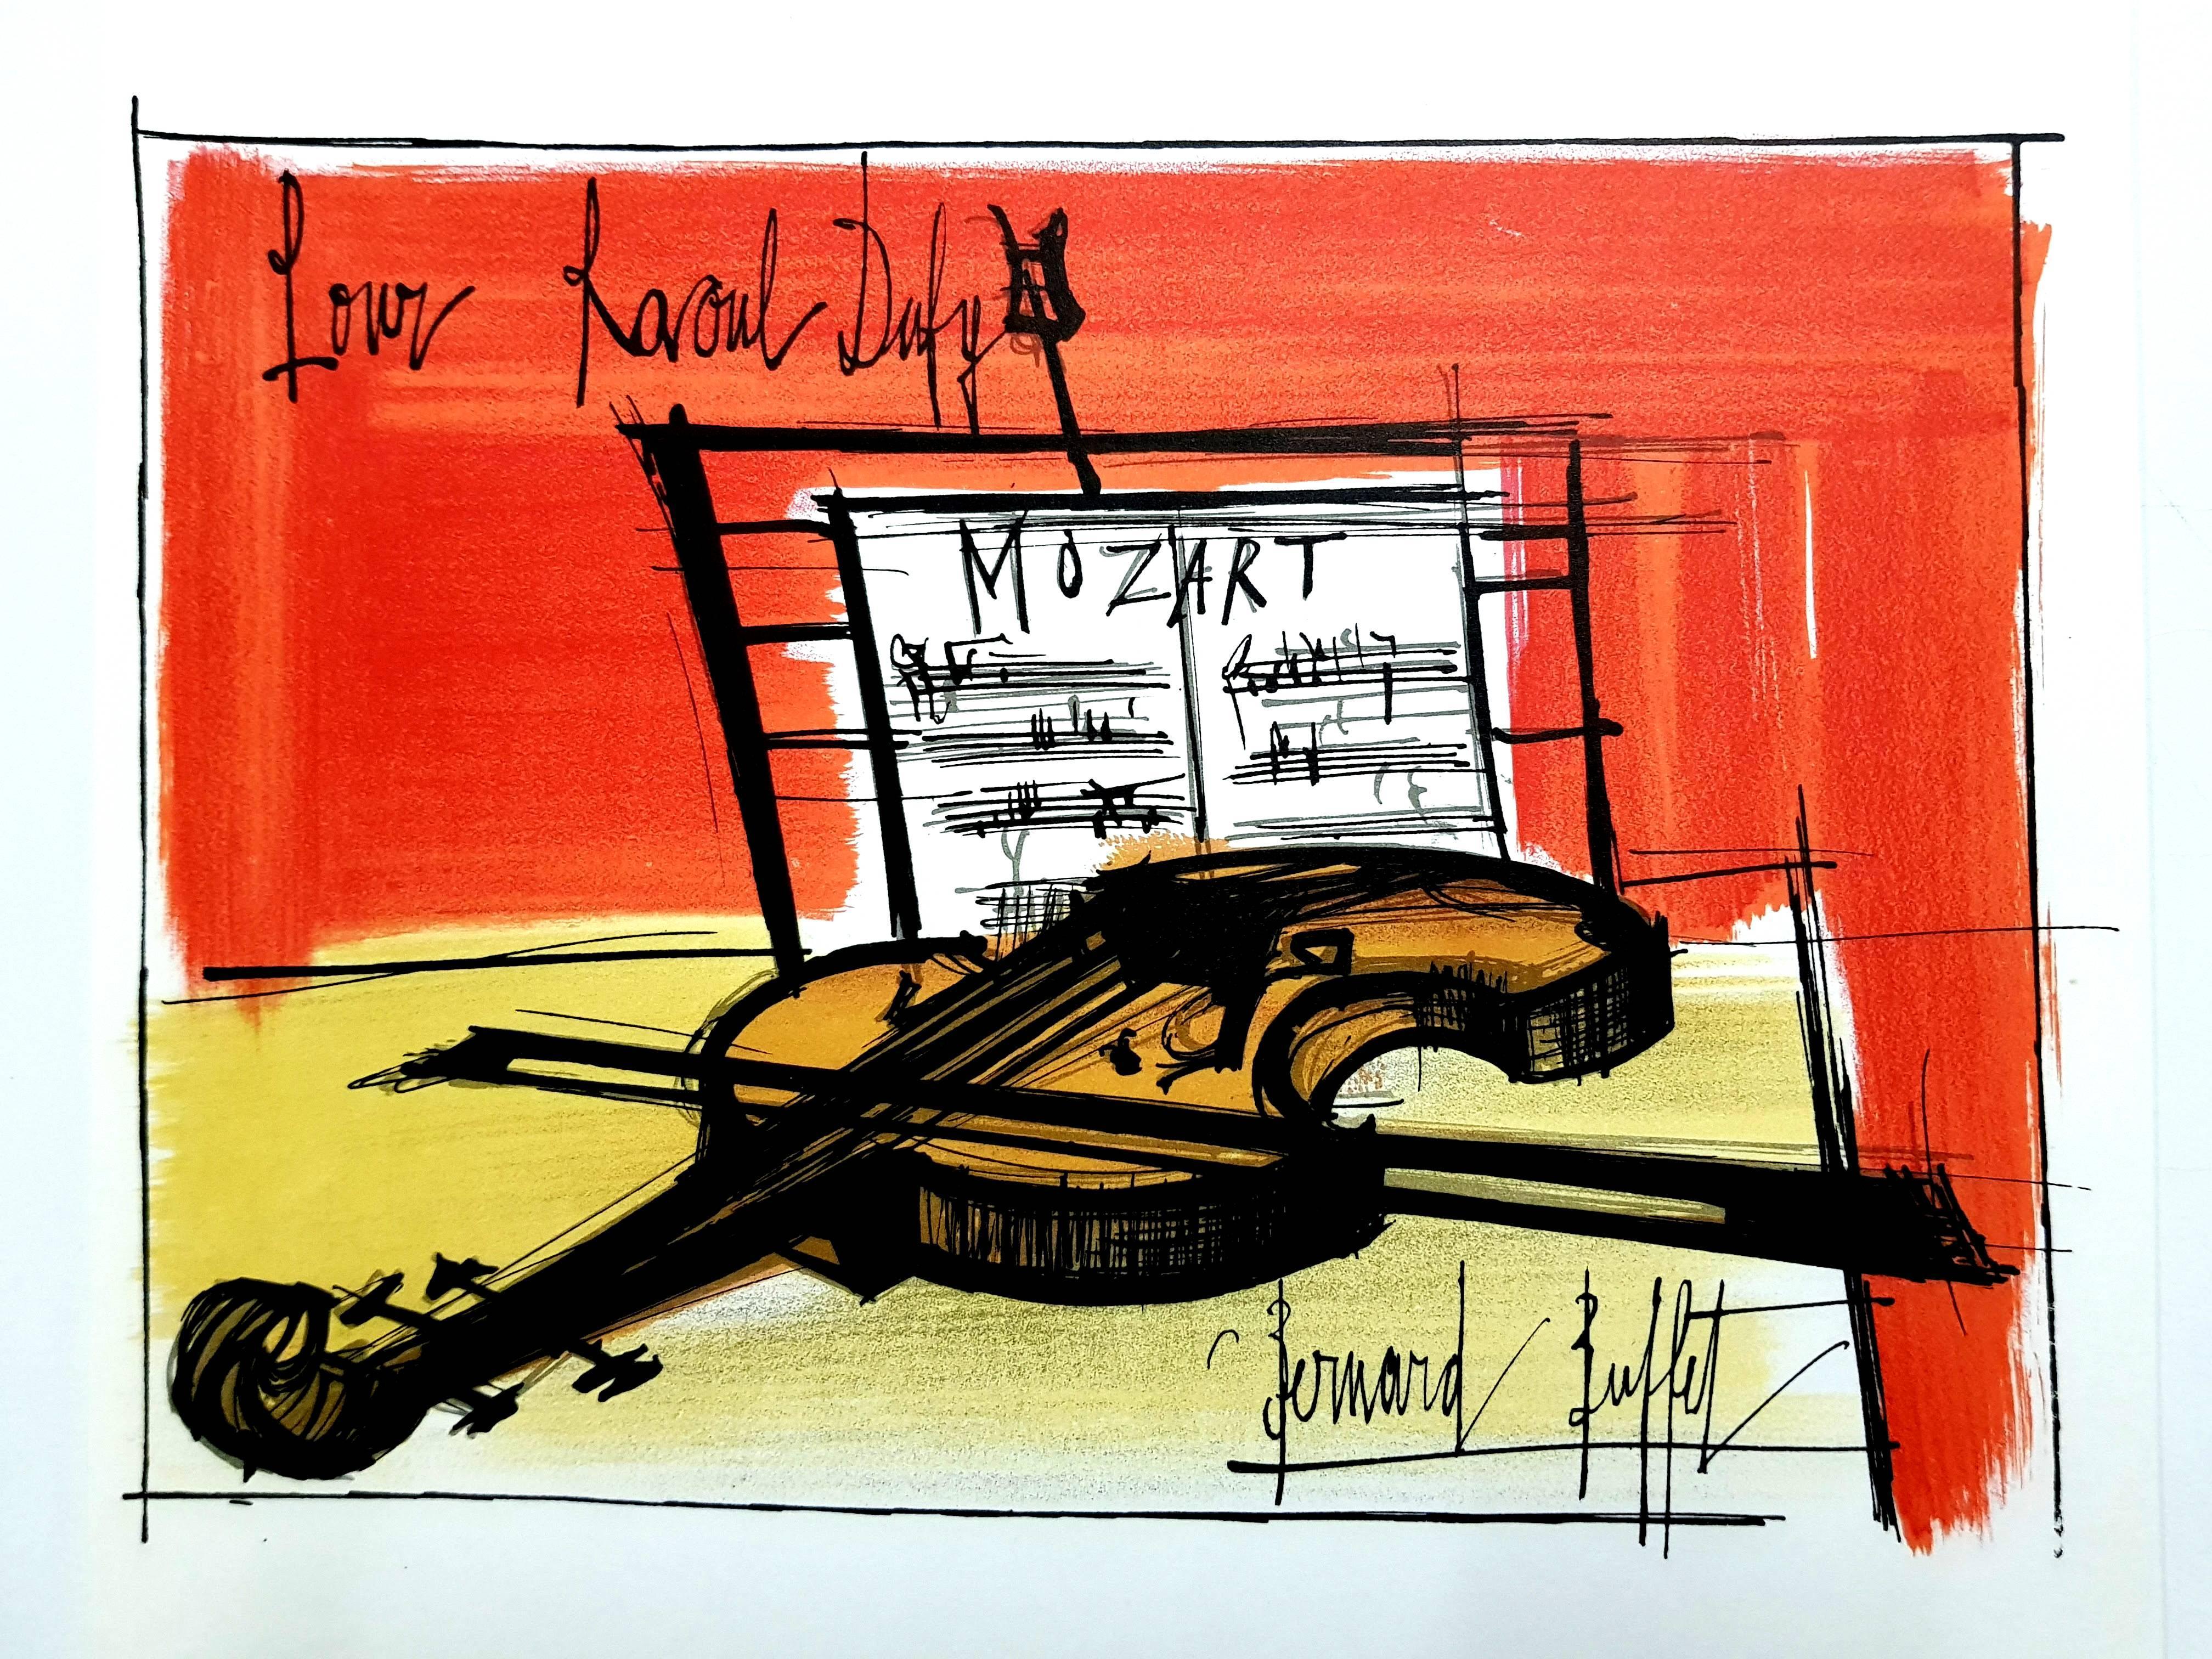 Remarkable Bernard Buffet Art 66 For Sale At 1Stdibs Download Free Architecture Designs Sospemadebymaigaardcom